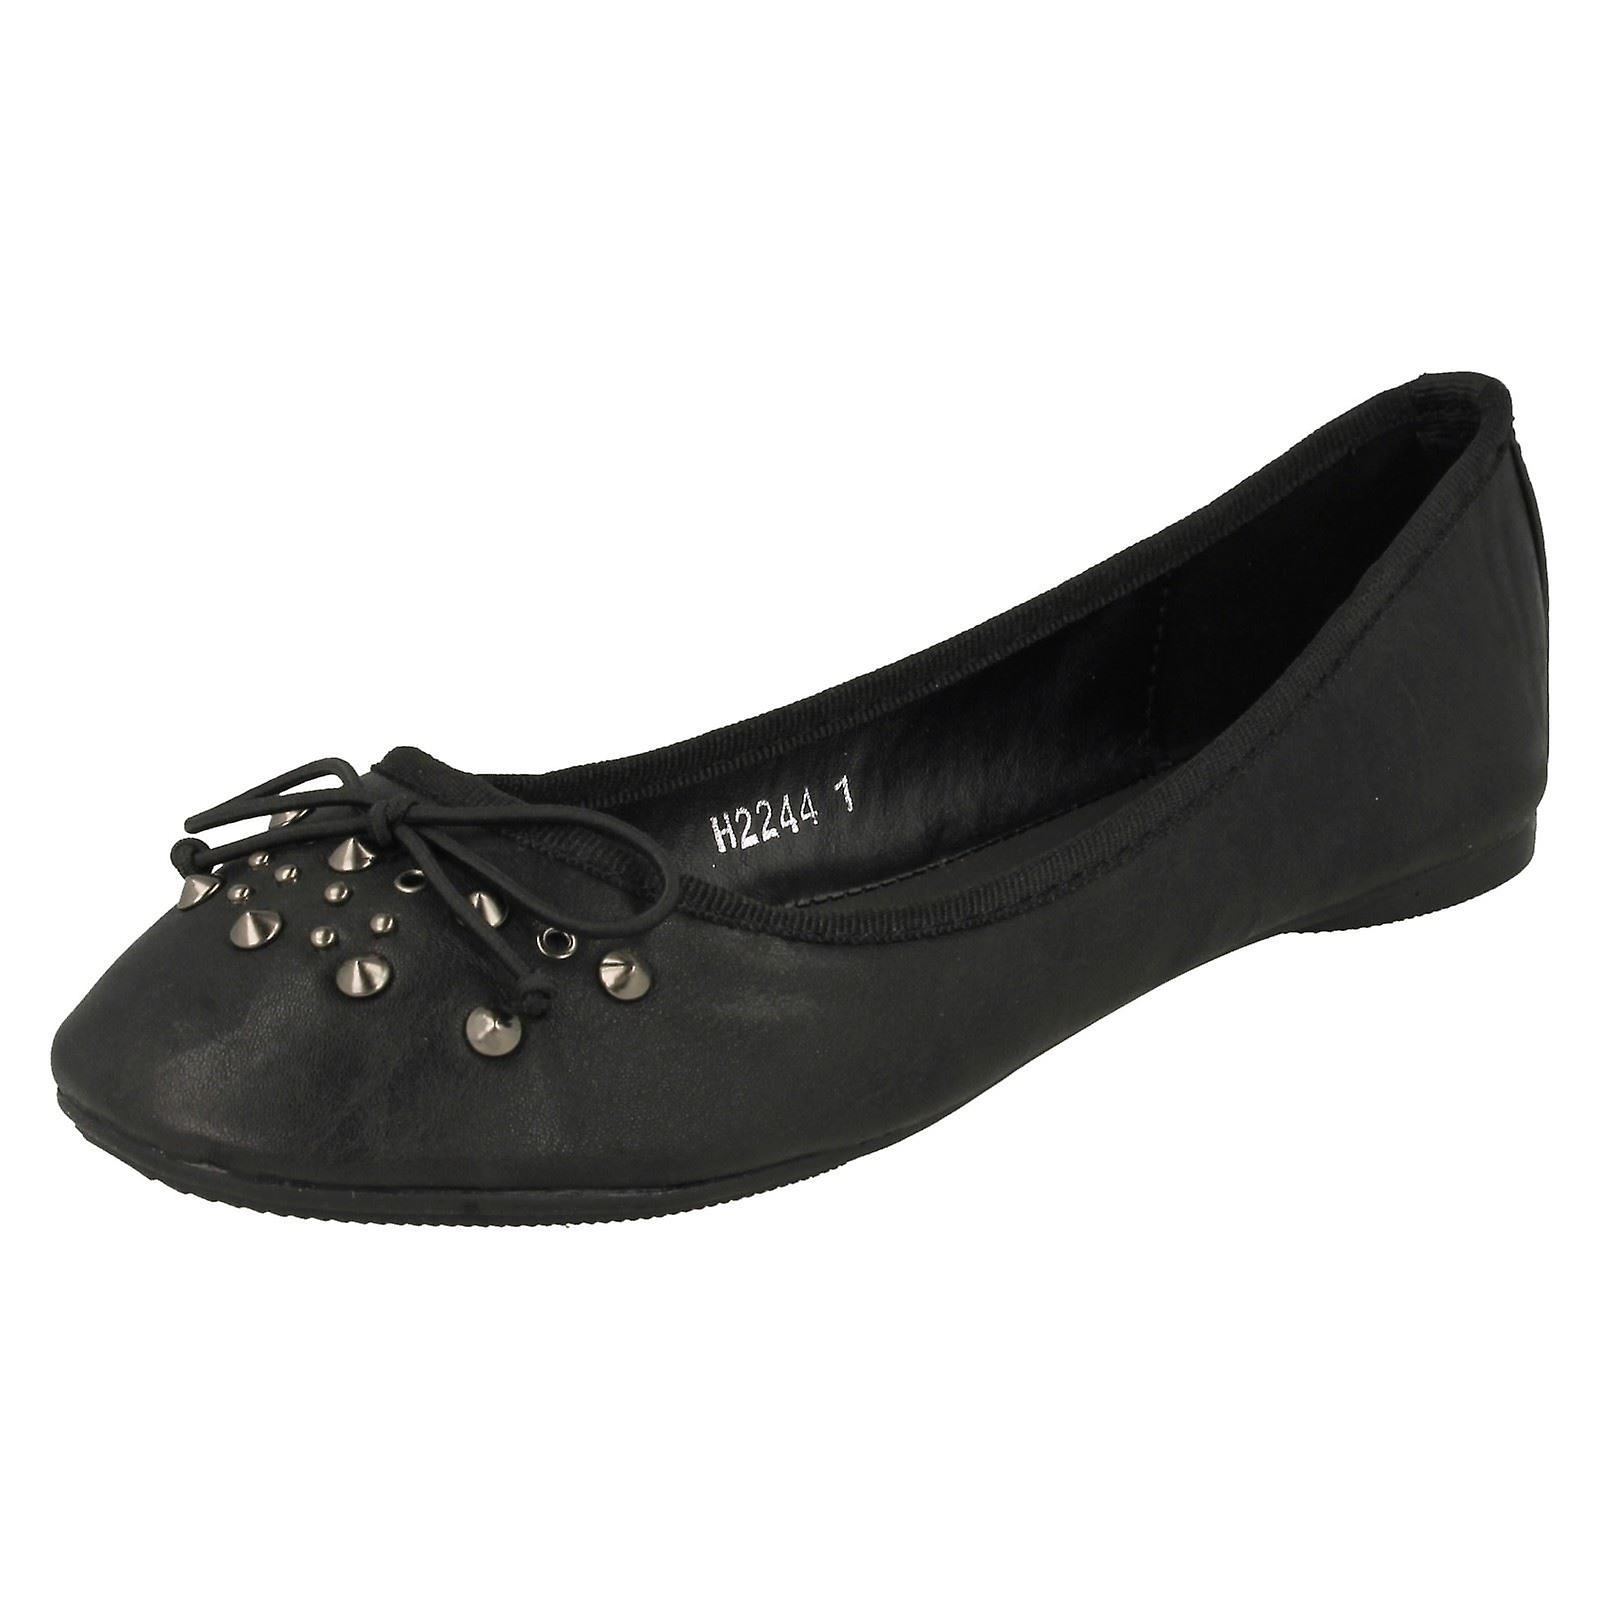 Mädchen Cutie flache Ballett Schuh